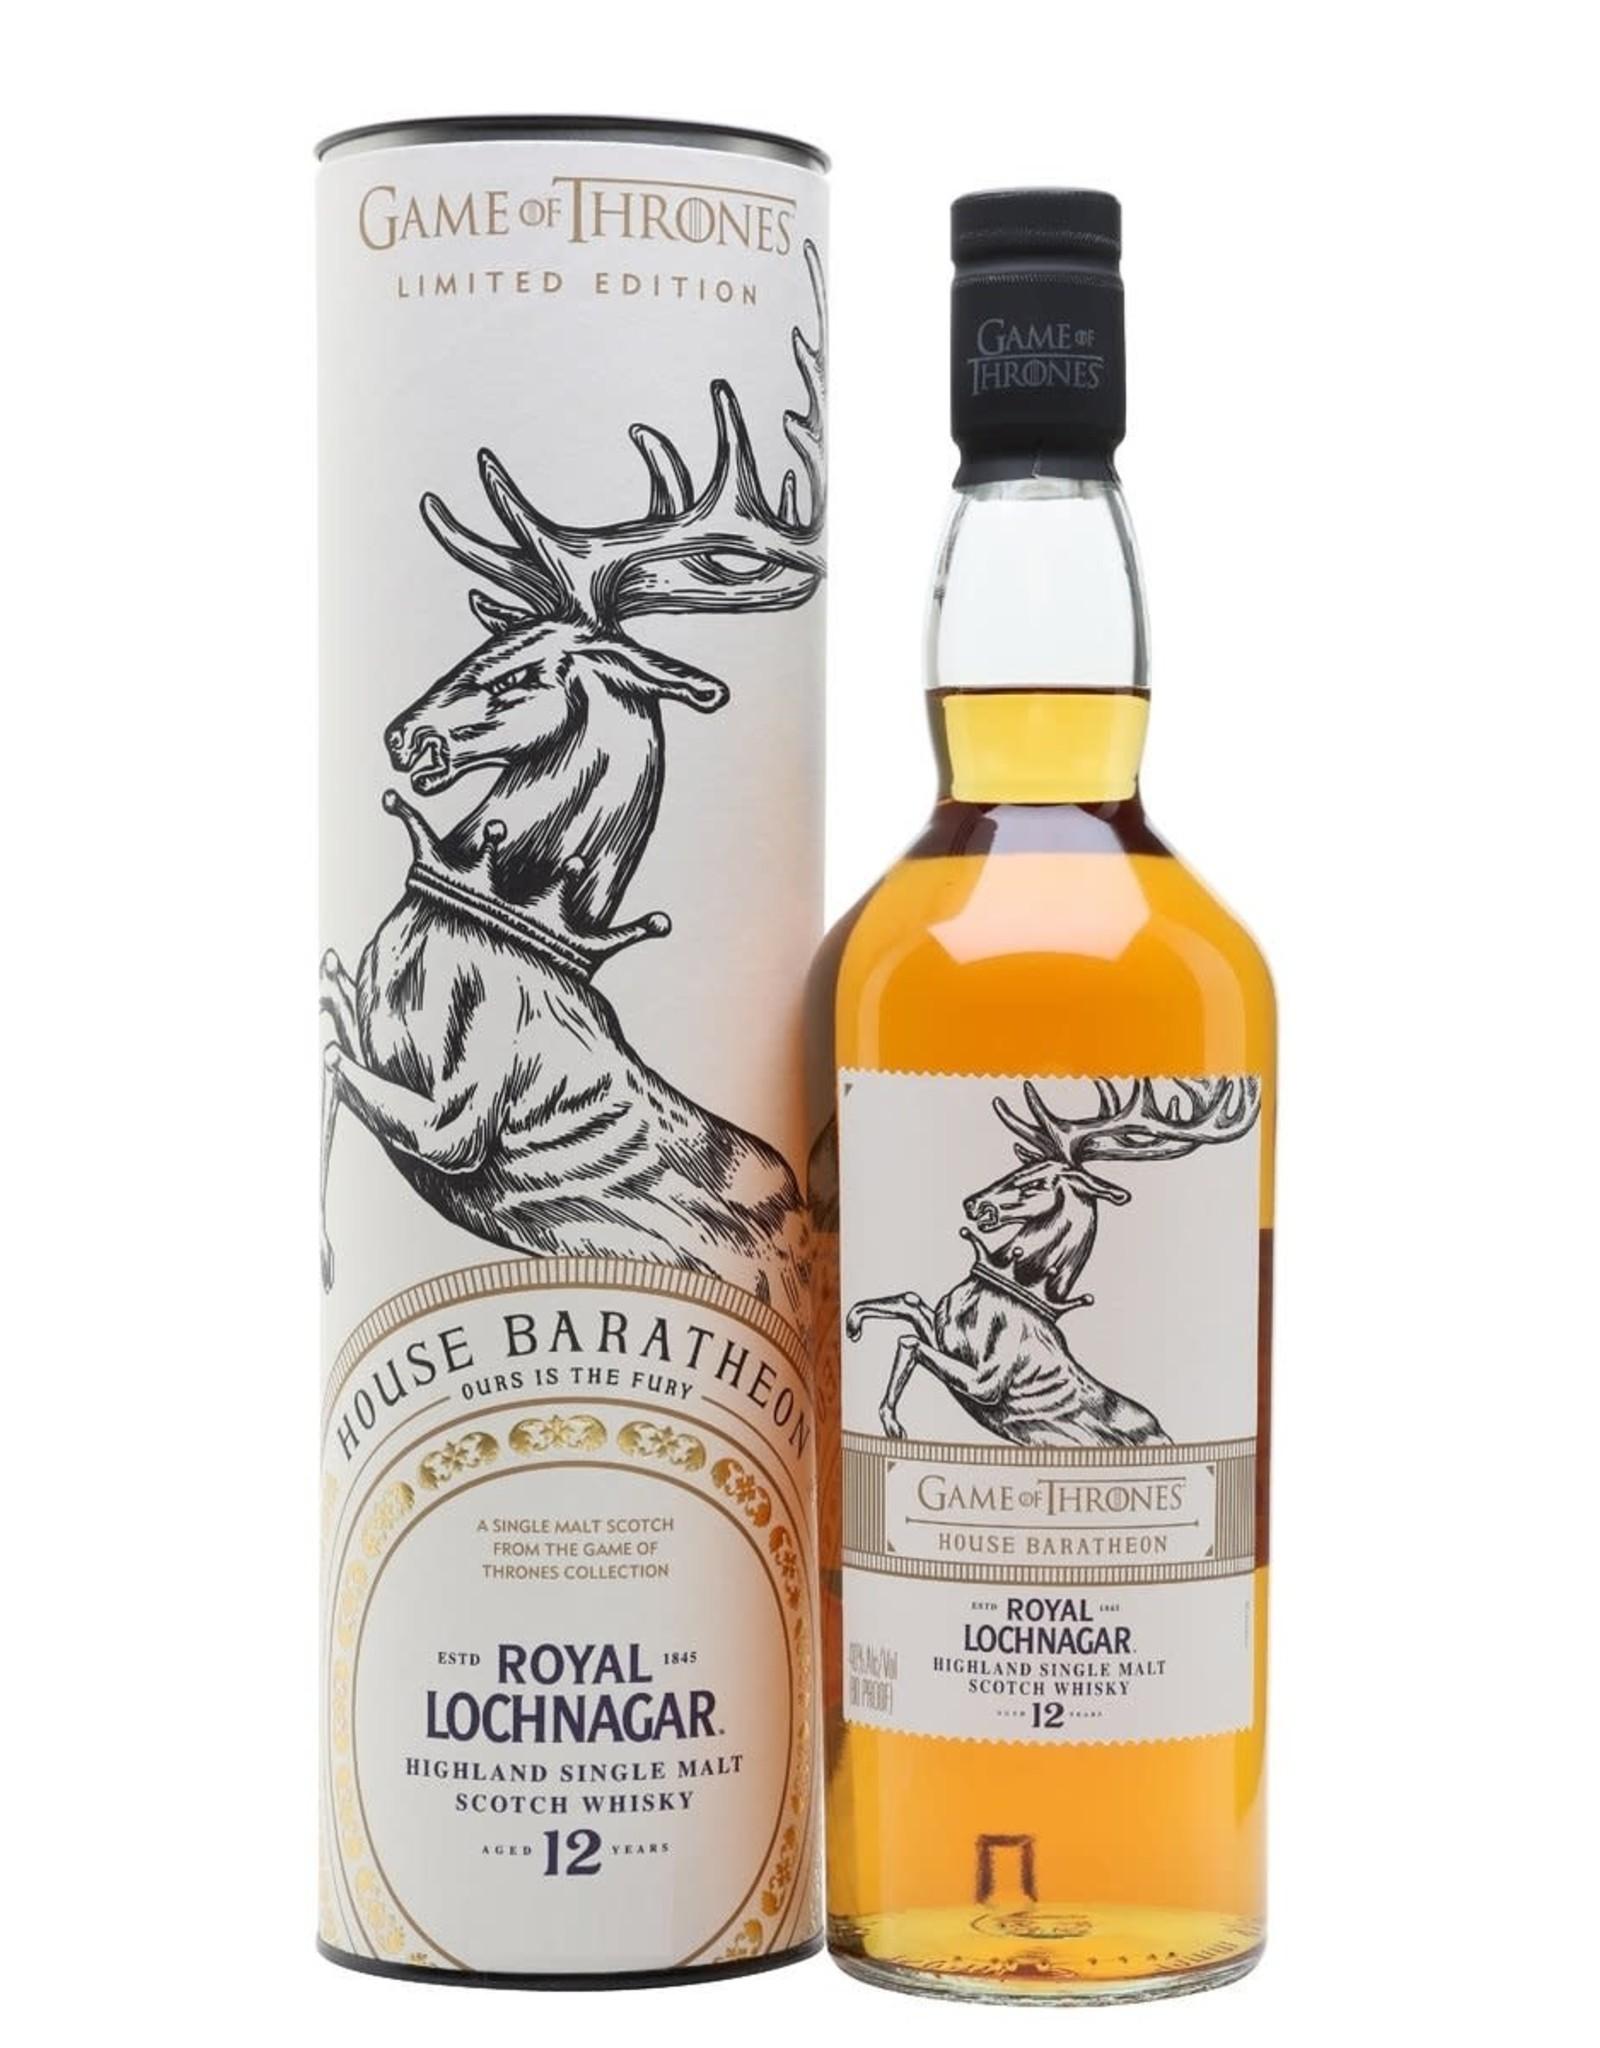 Game of Thrones Limited Edition House Baratheon Royal Lochnagar 12 year